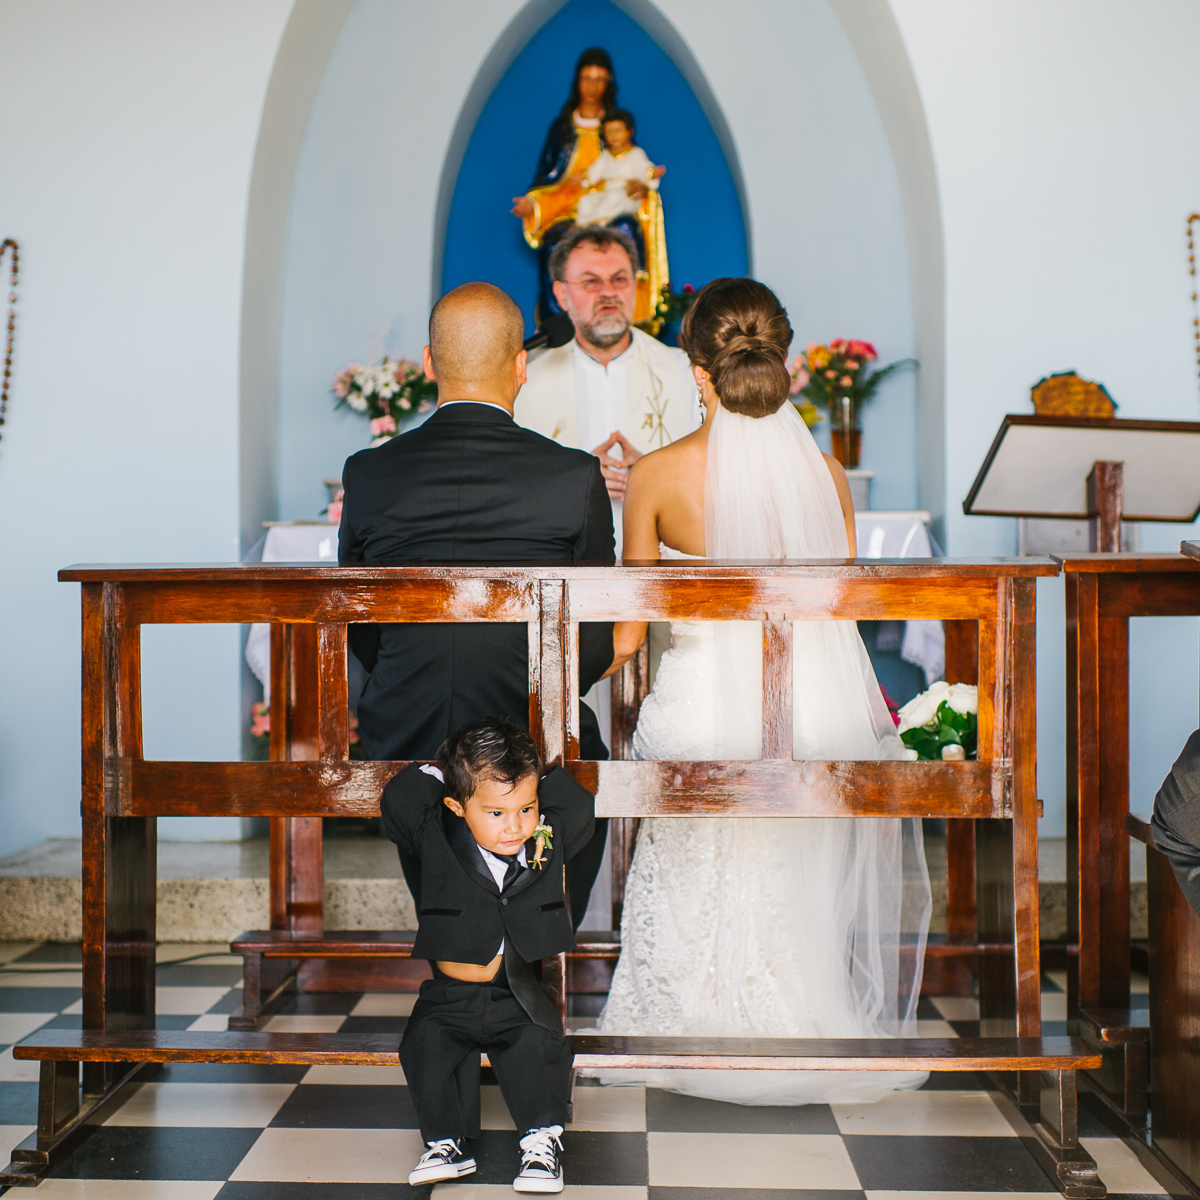 tara mcmullen photography aruba wedding photographer canadian wedding in aruba australian wedding aruba alto vista wedding aruba-015